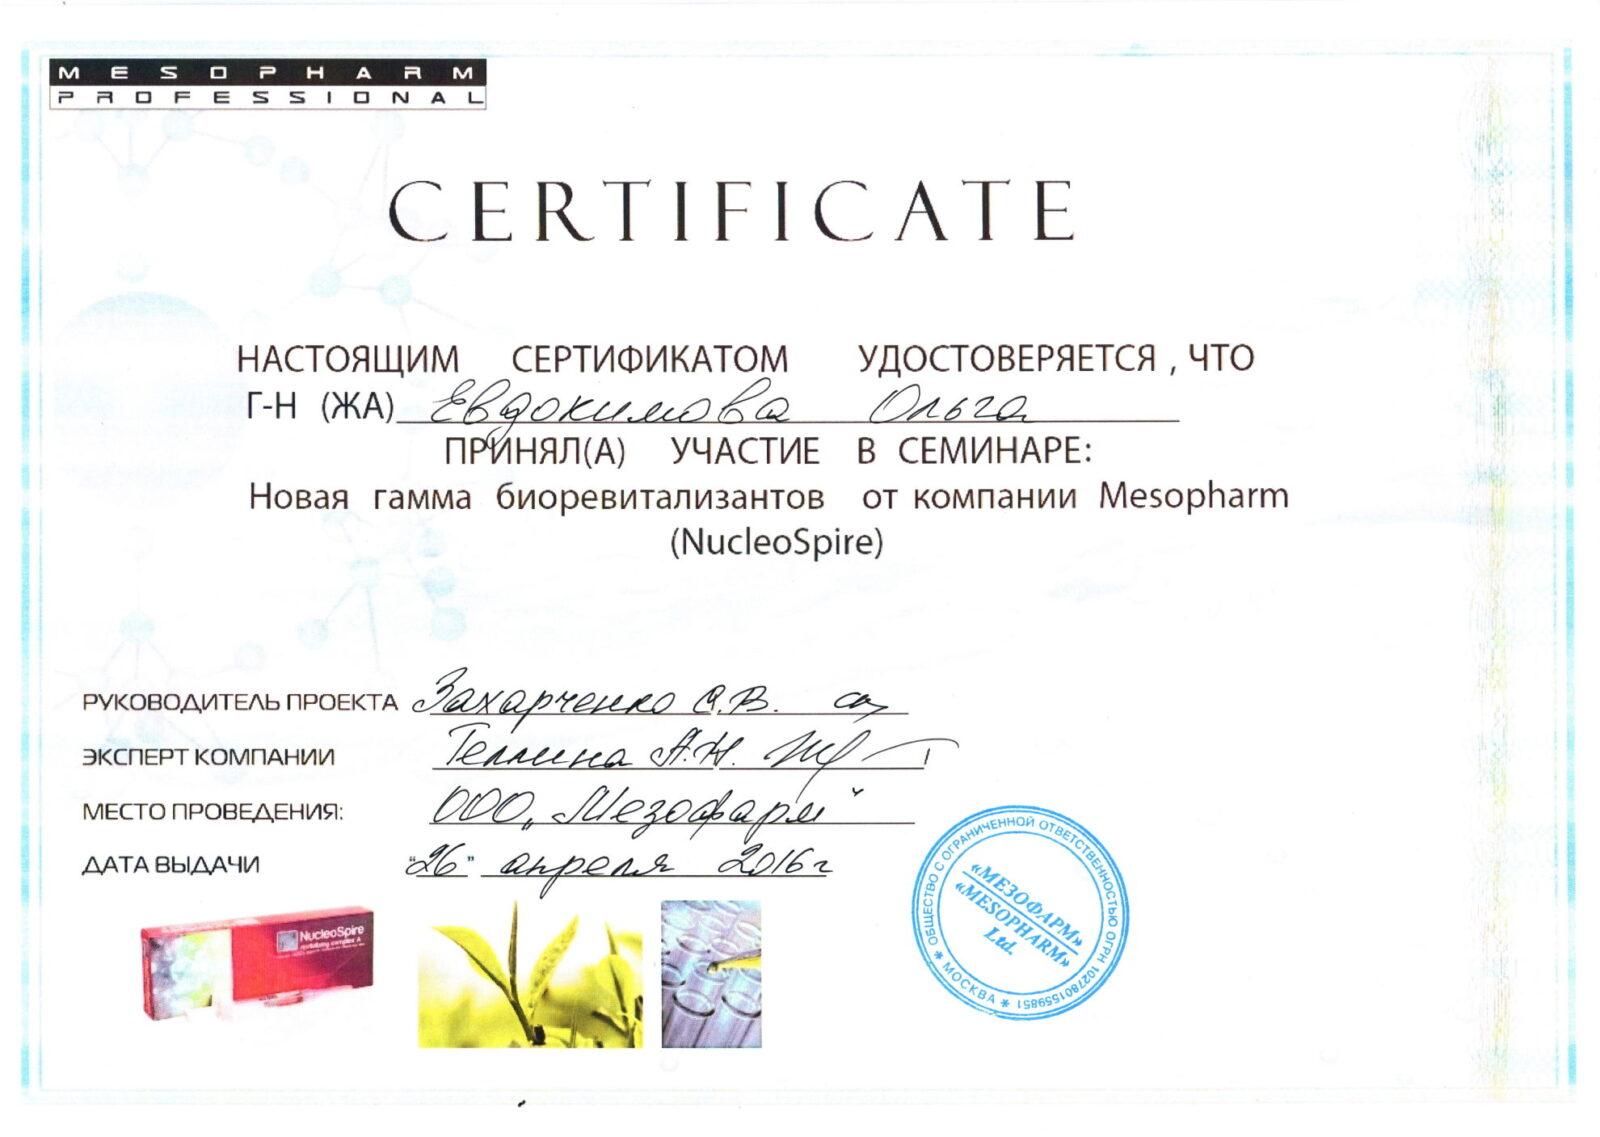 2016.04.26 Сертификат